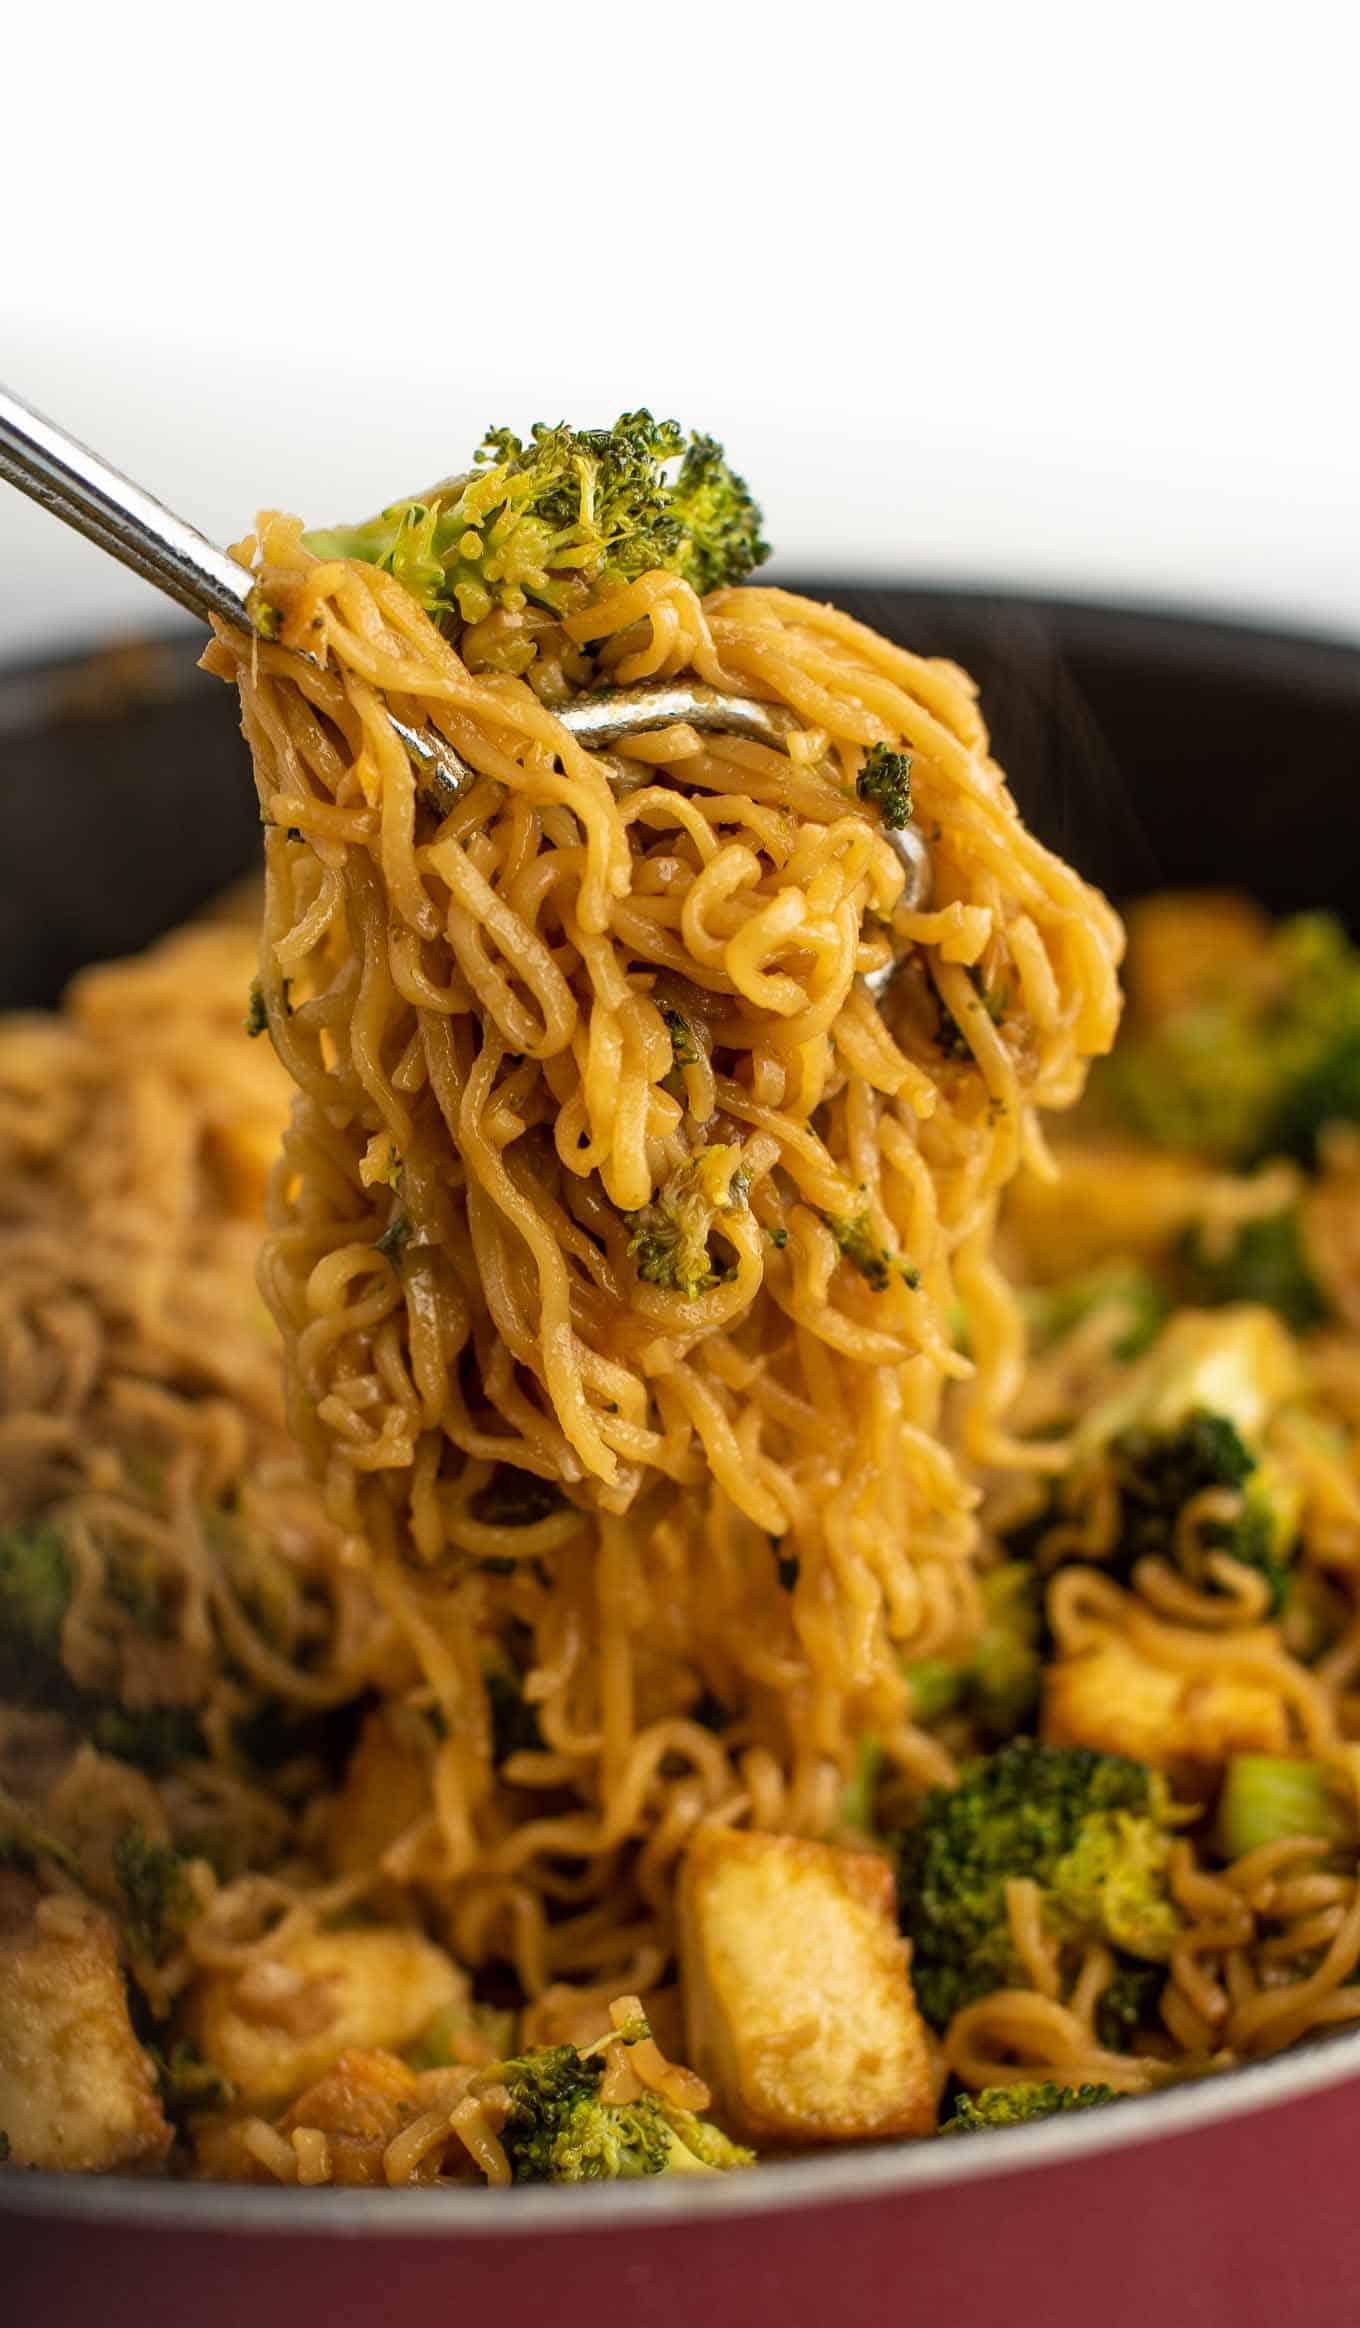 tongs grabbing the ramen noodles